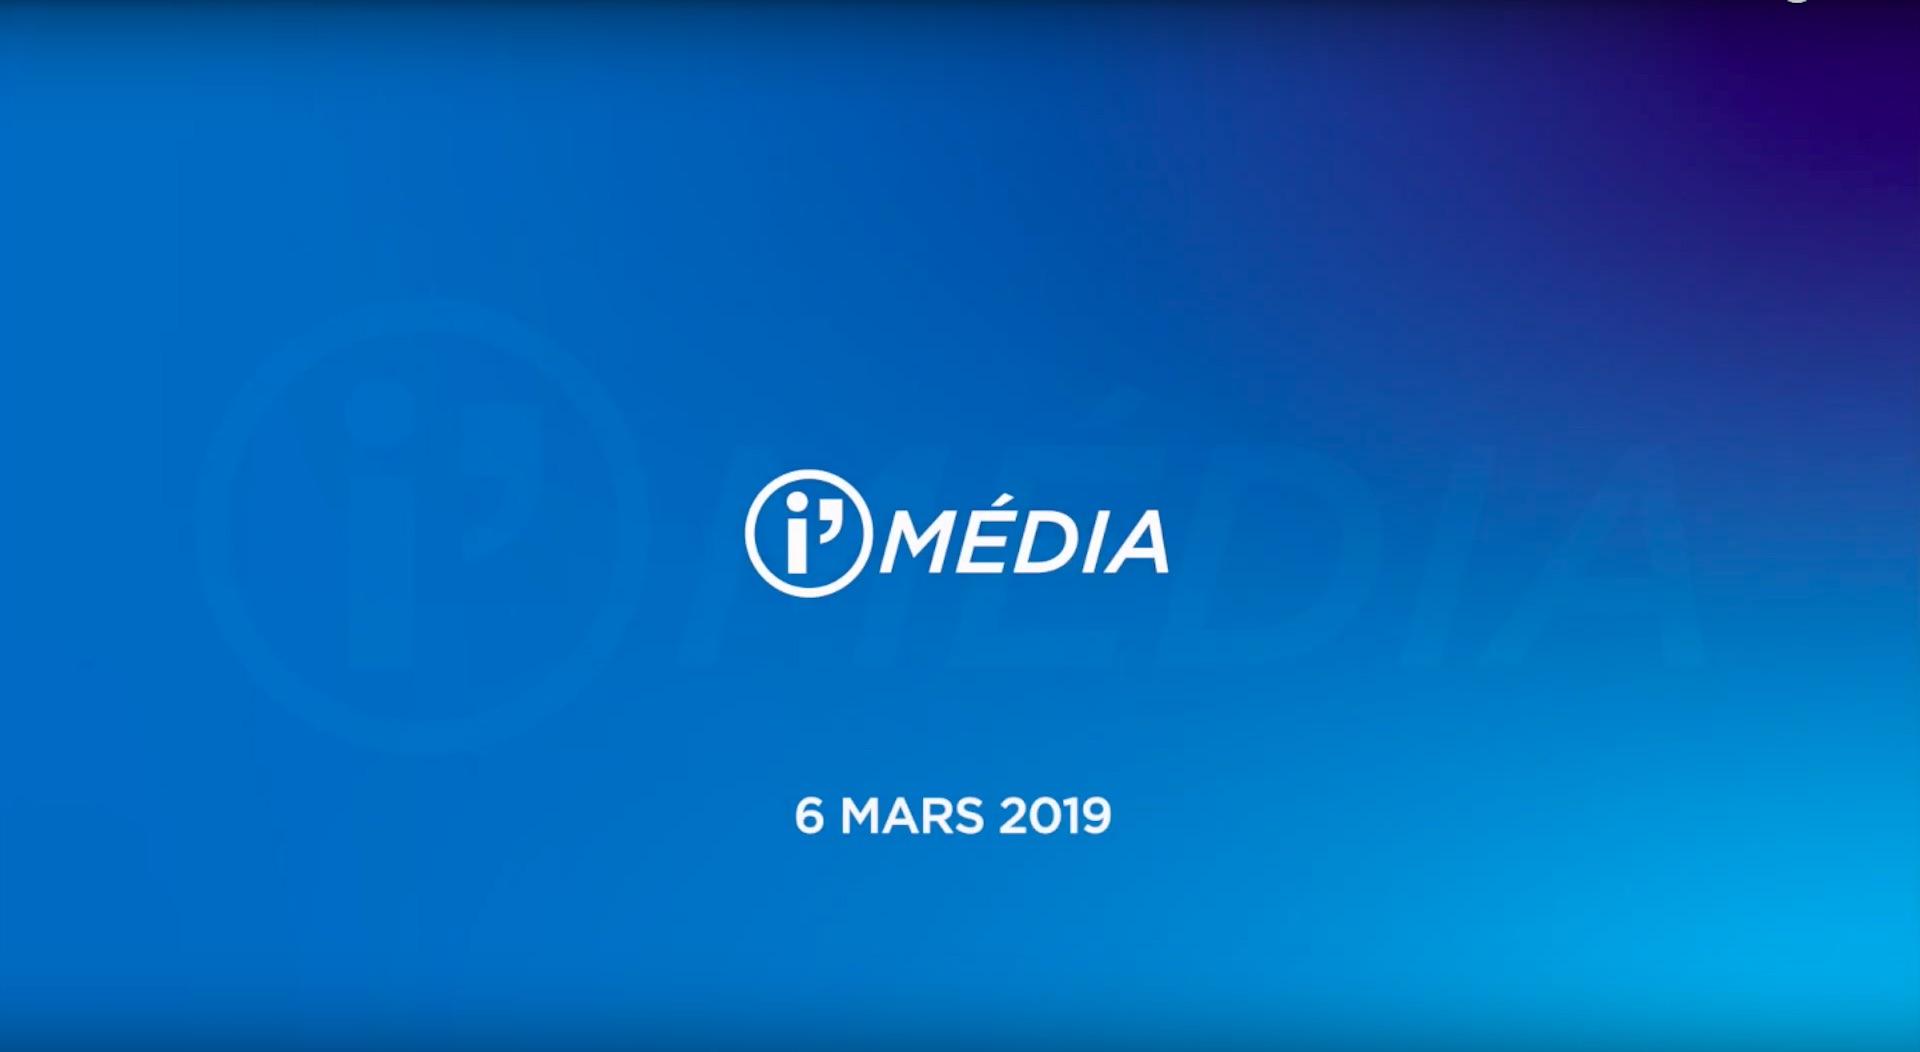 Capture I'média 6 mars 2019